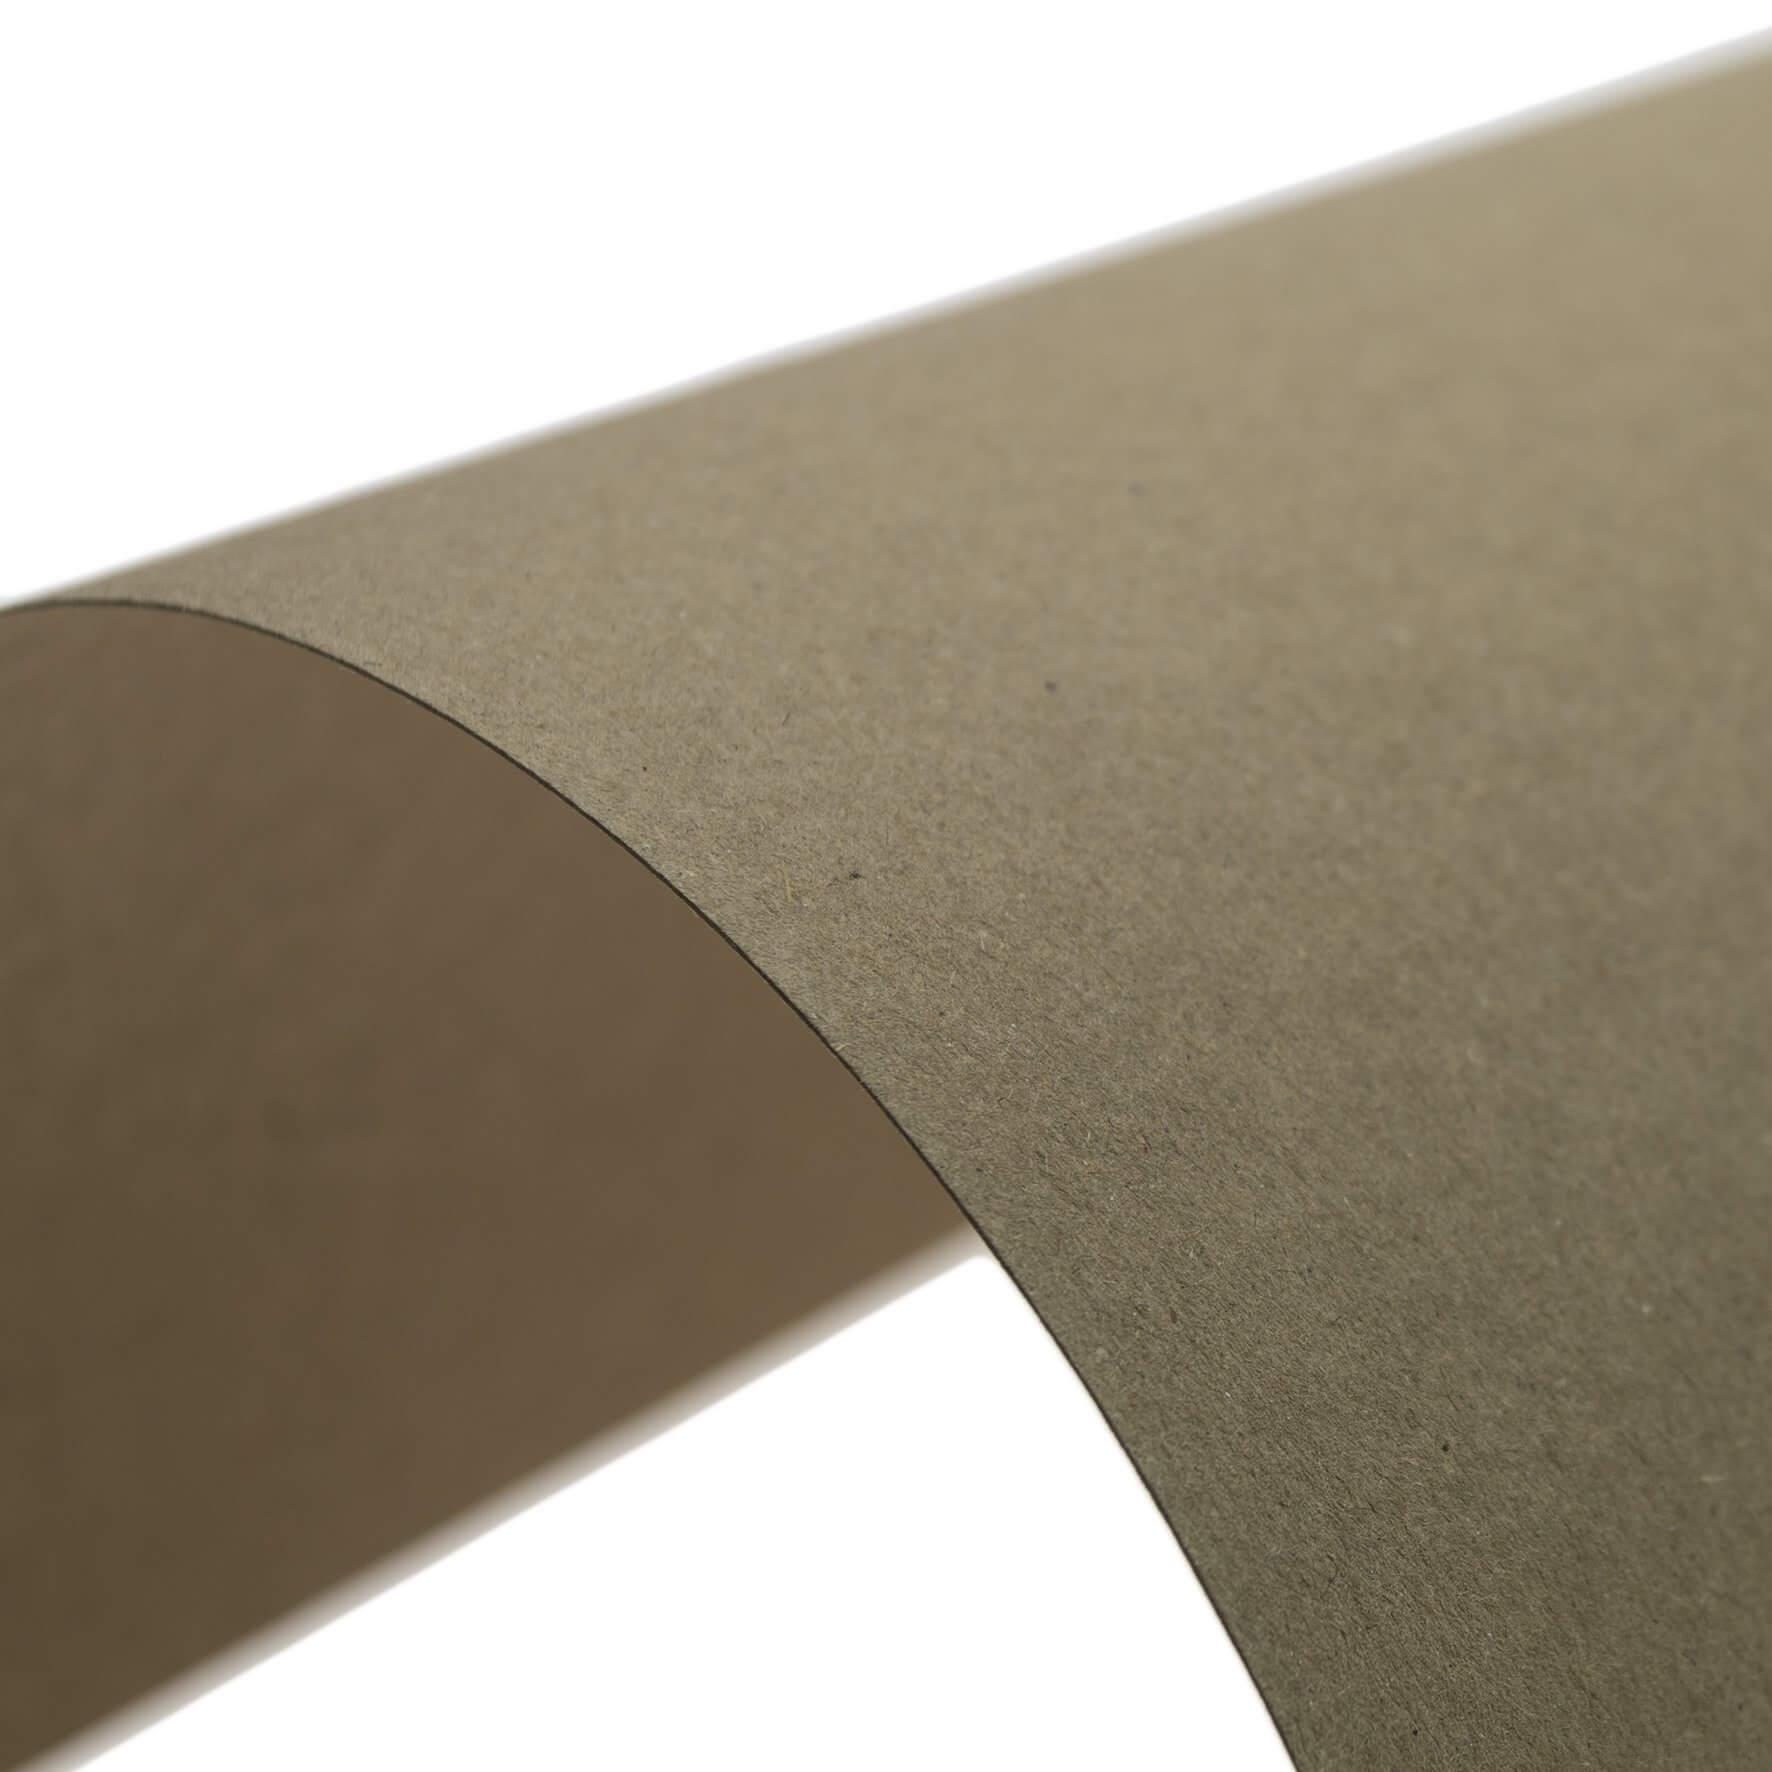 Cardstock A4 Sheet - Kraft - Swatch